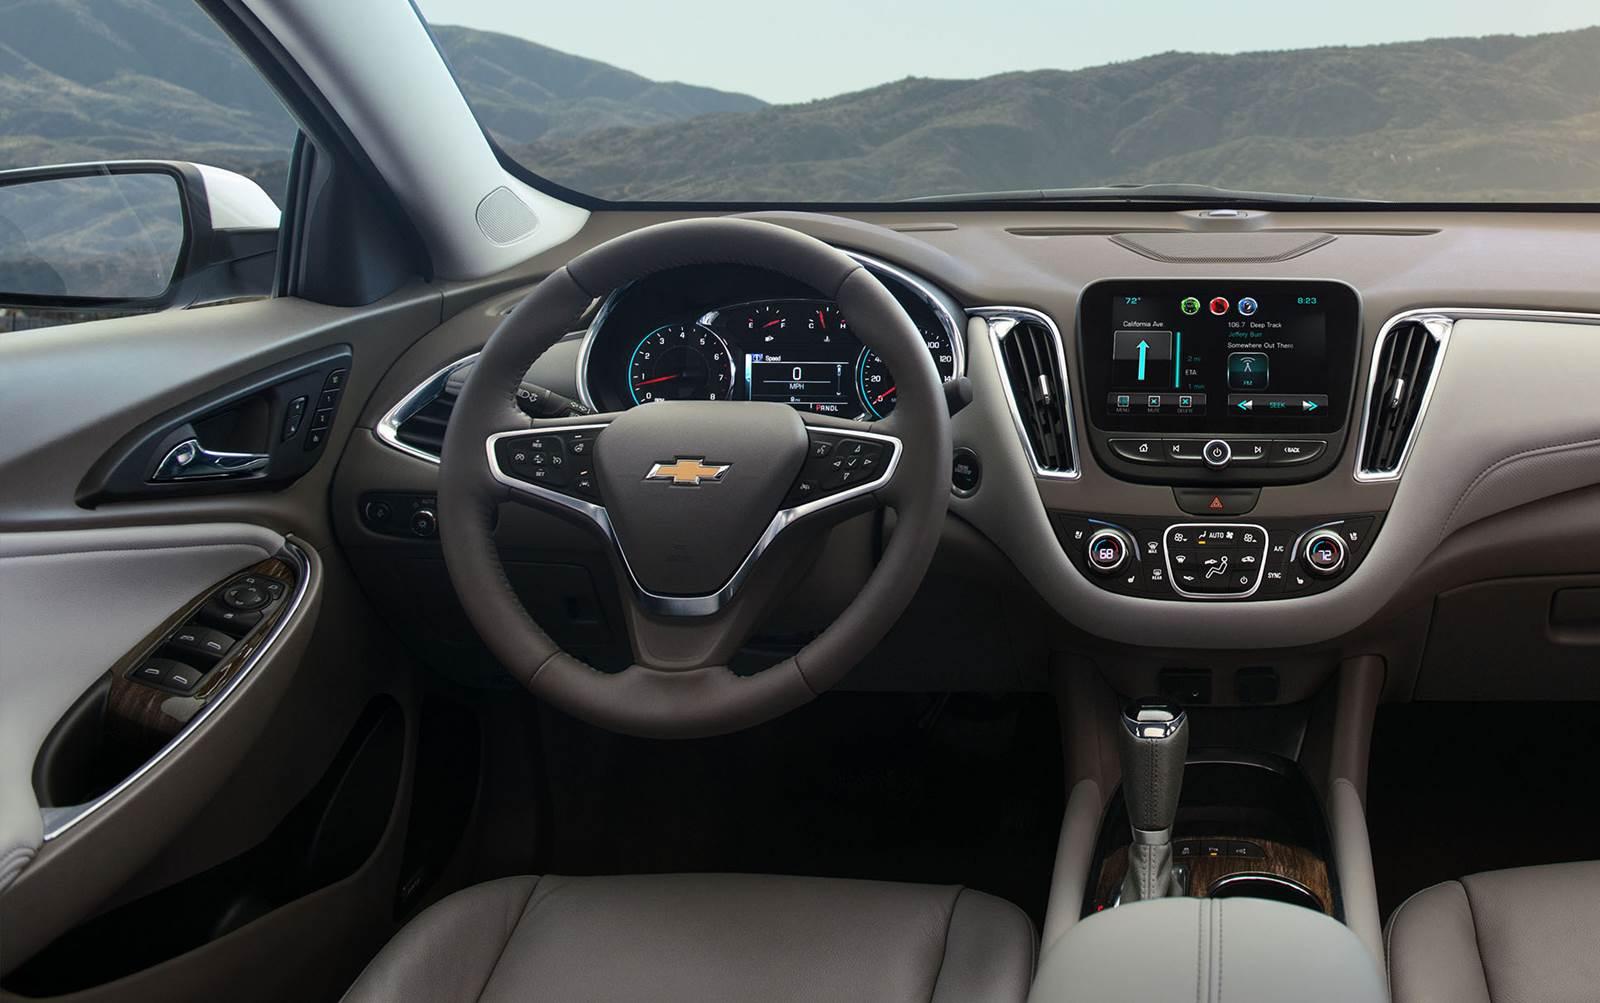 Chevrolet Malibu 2017 - Interior